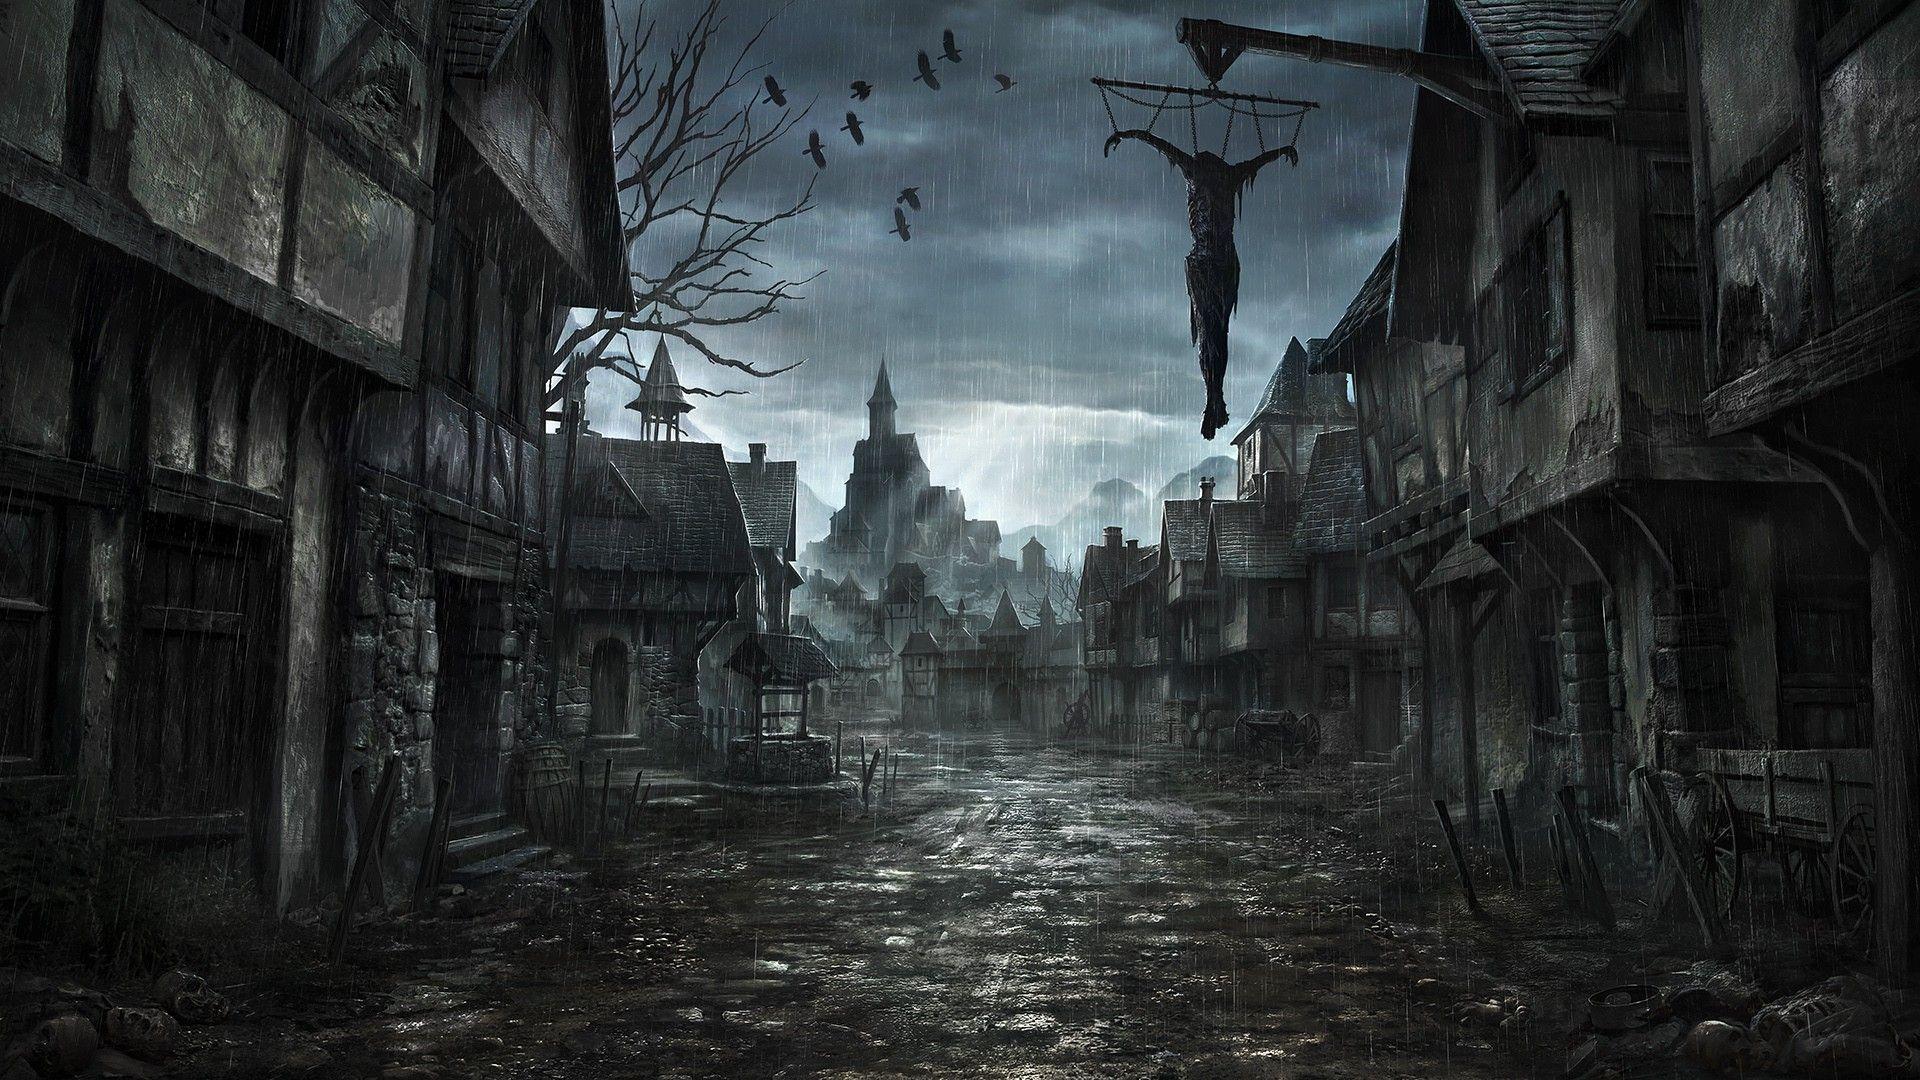 Epic Fantasy Wallpapers Dark Desktop Dark Art Paintings Dark Fantasy Art Creepy Backgrounds